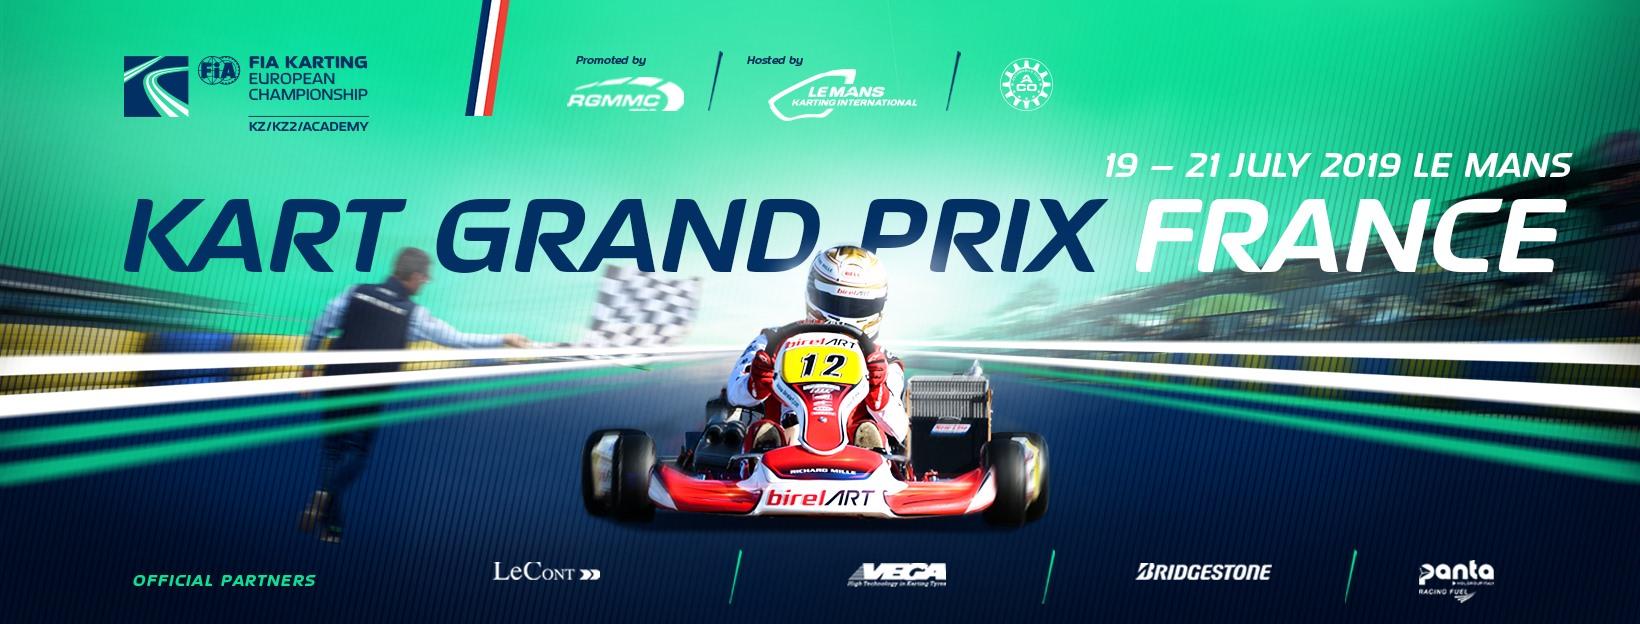 FIA Kart GP France 2.jpg